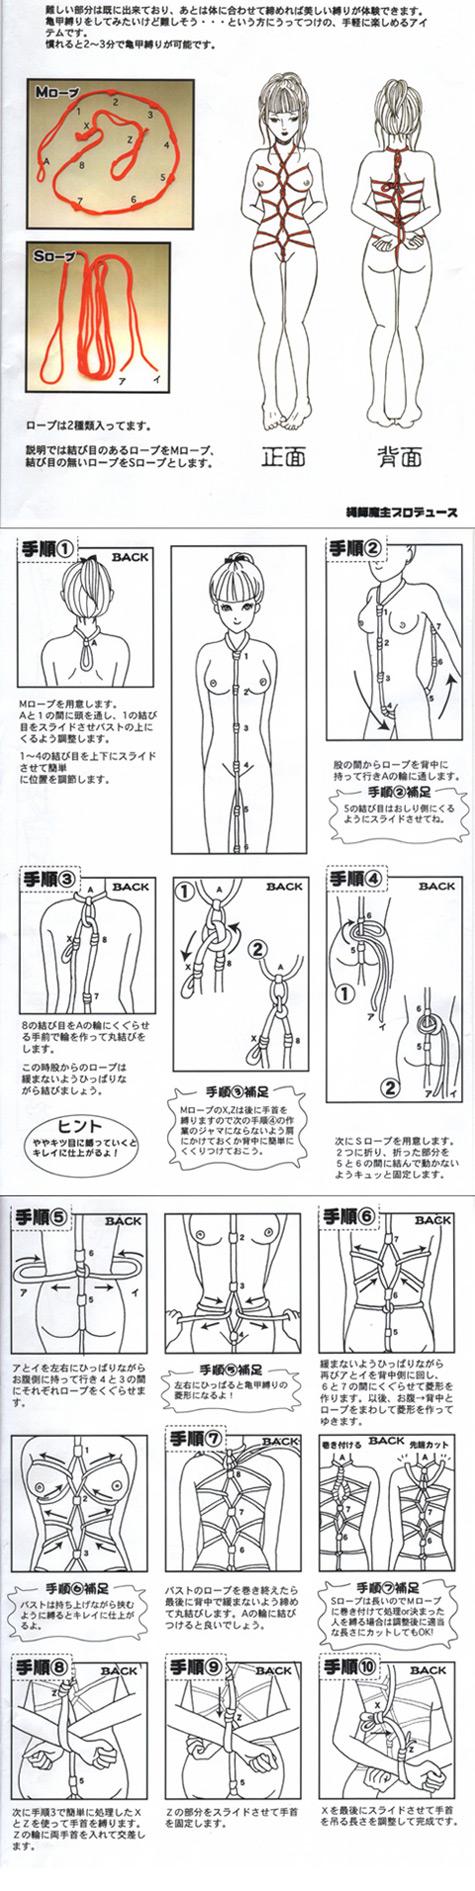 how exhentai into to log Sword art online yuuki nude